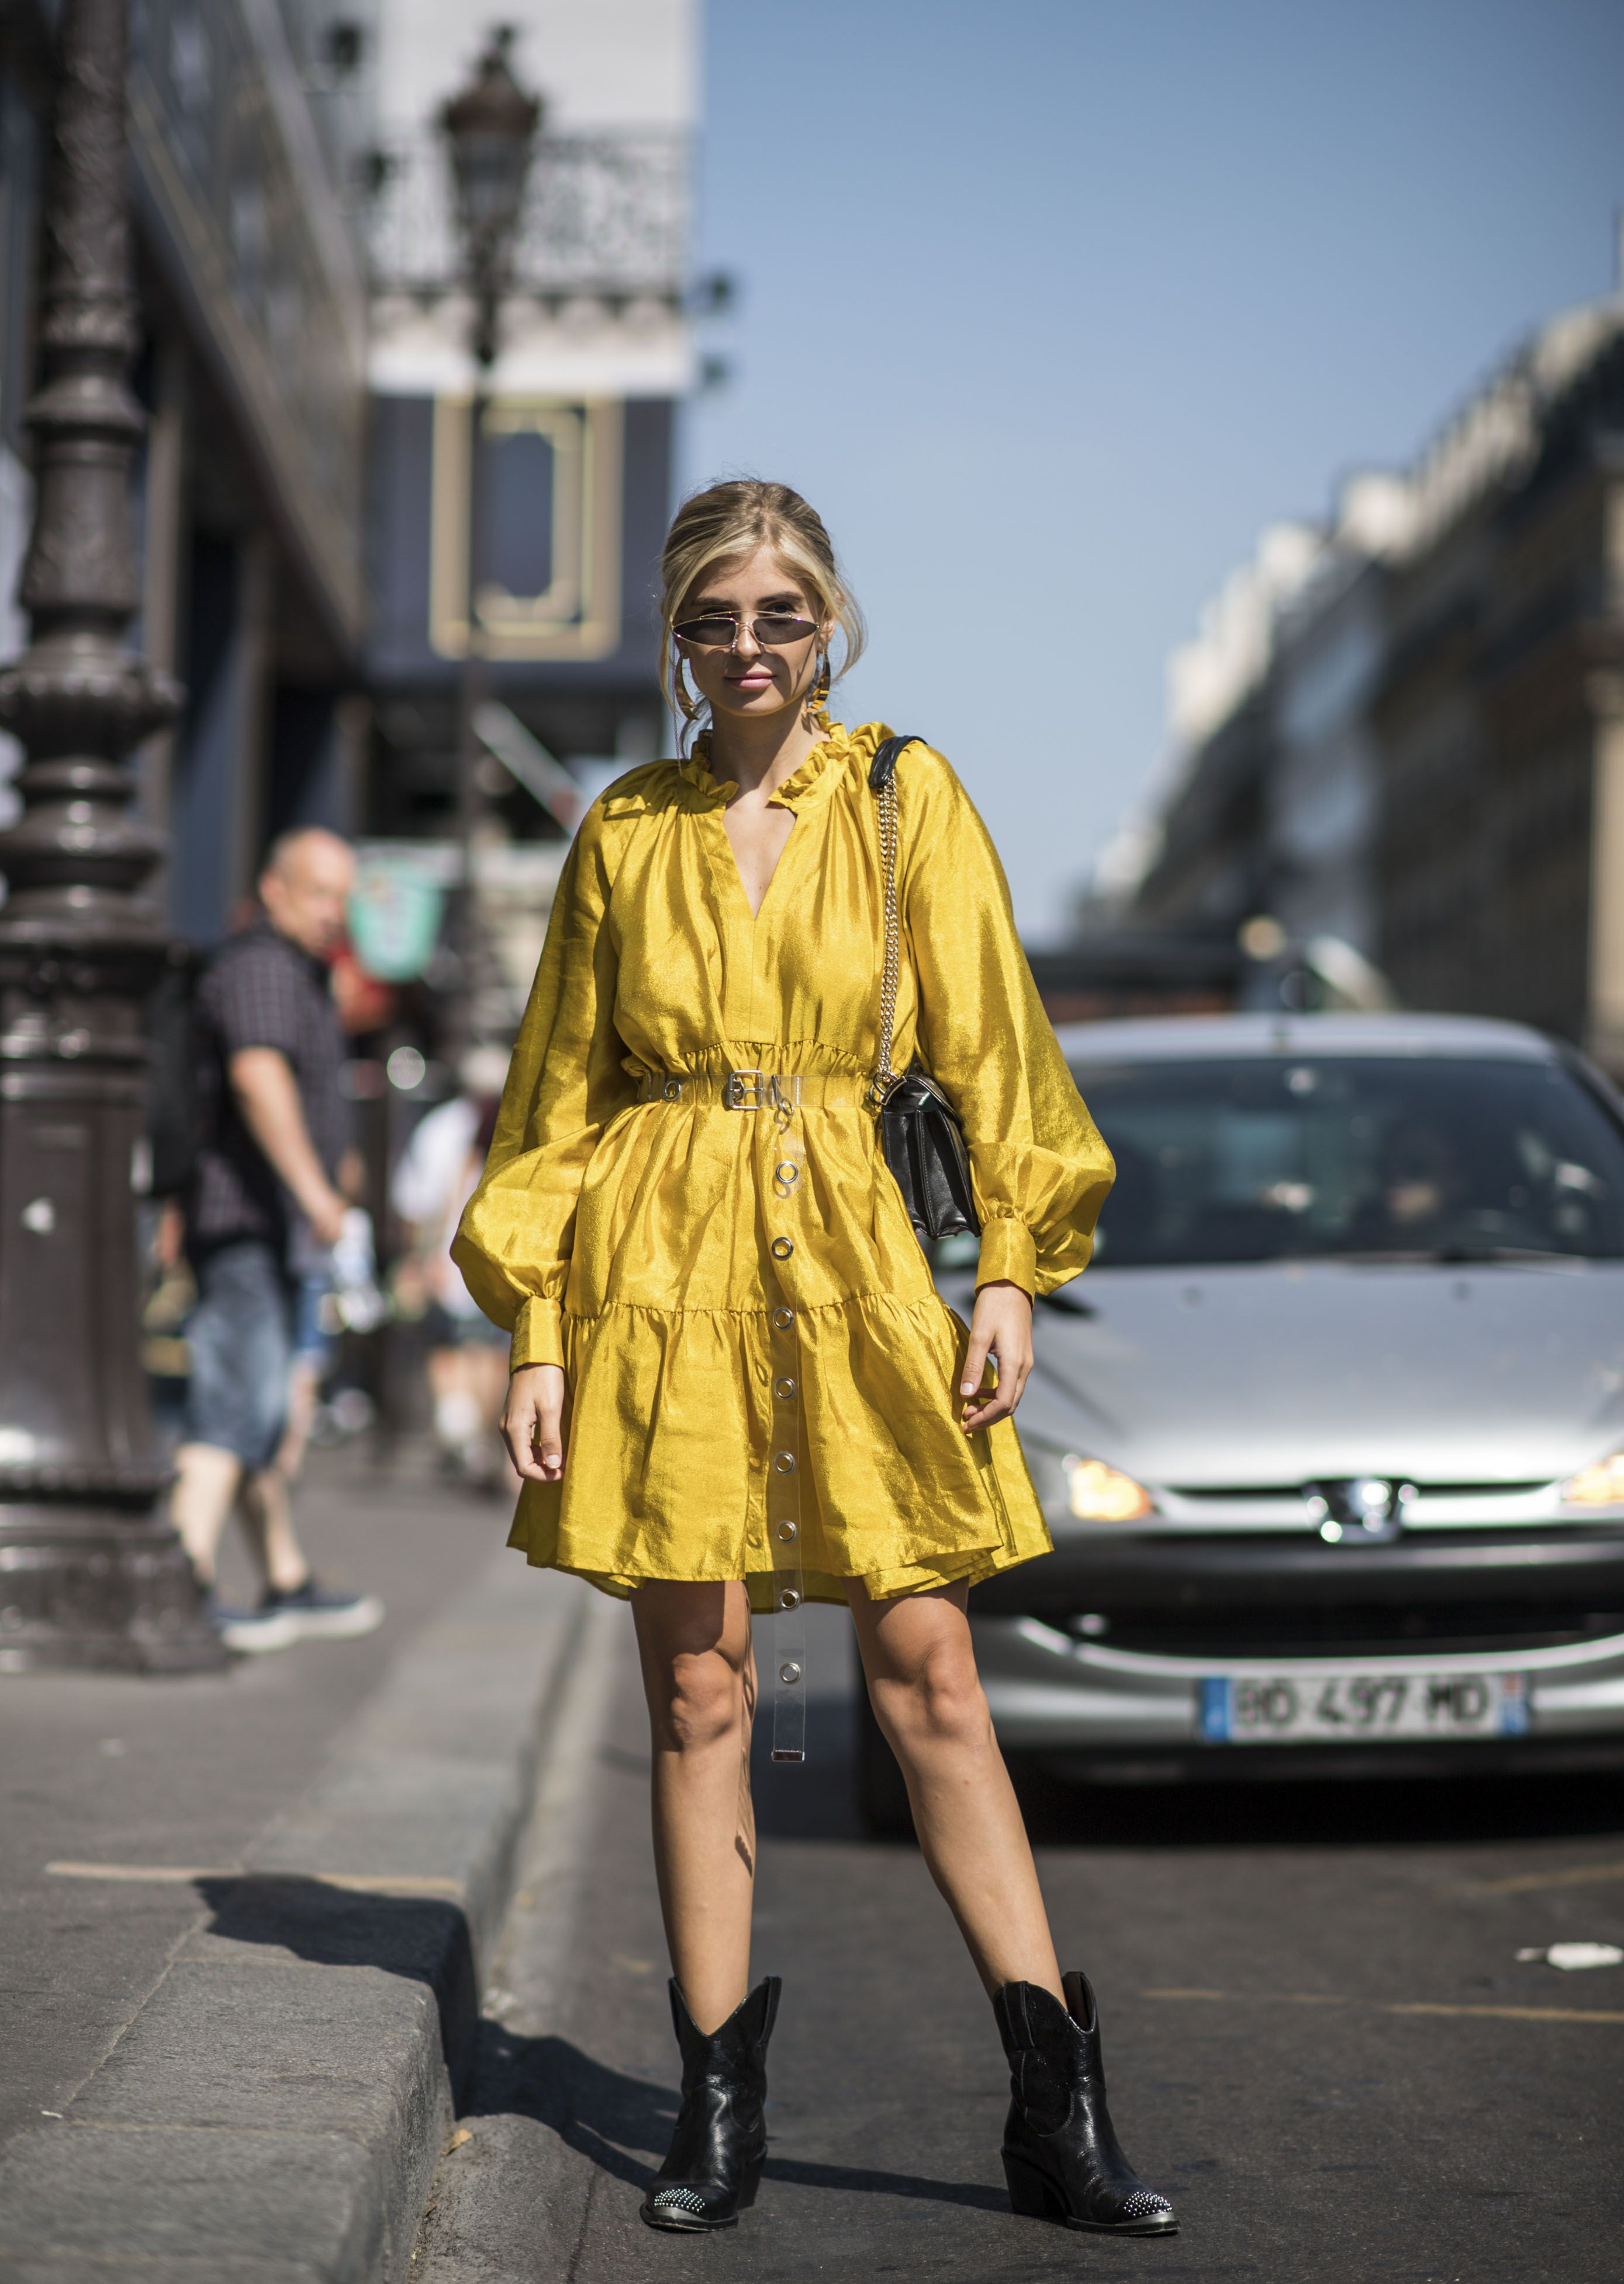 Fashion Boots Dress